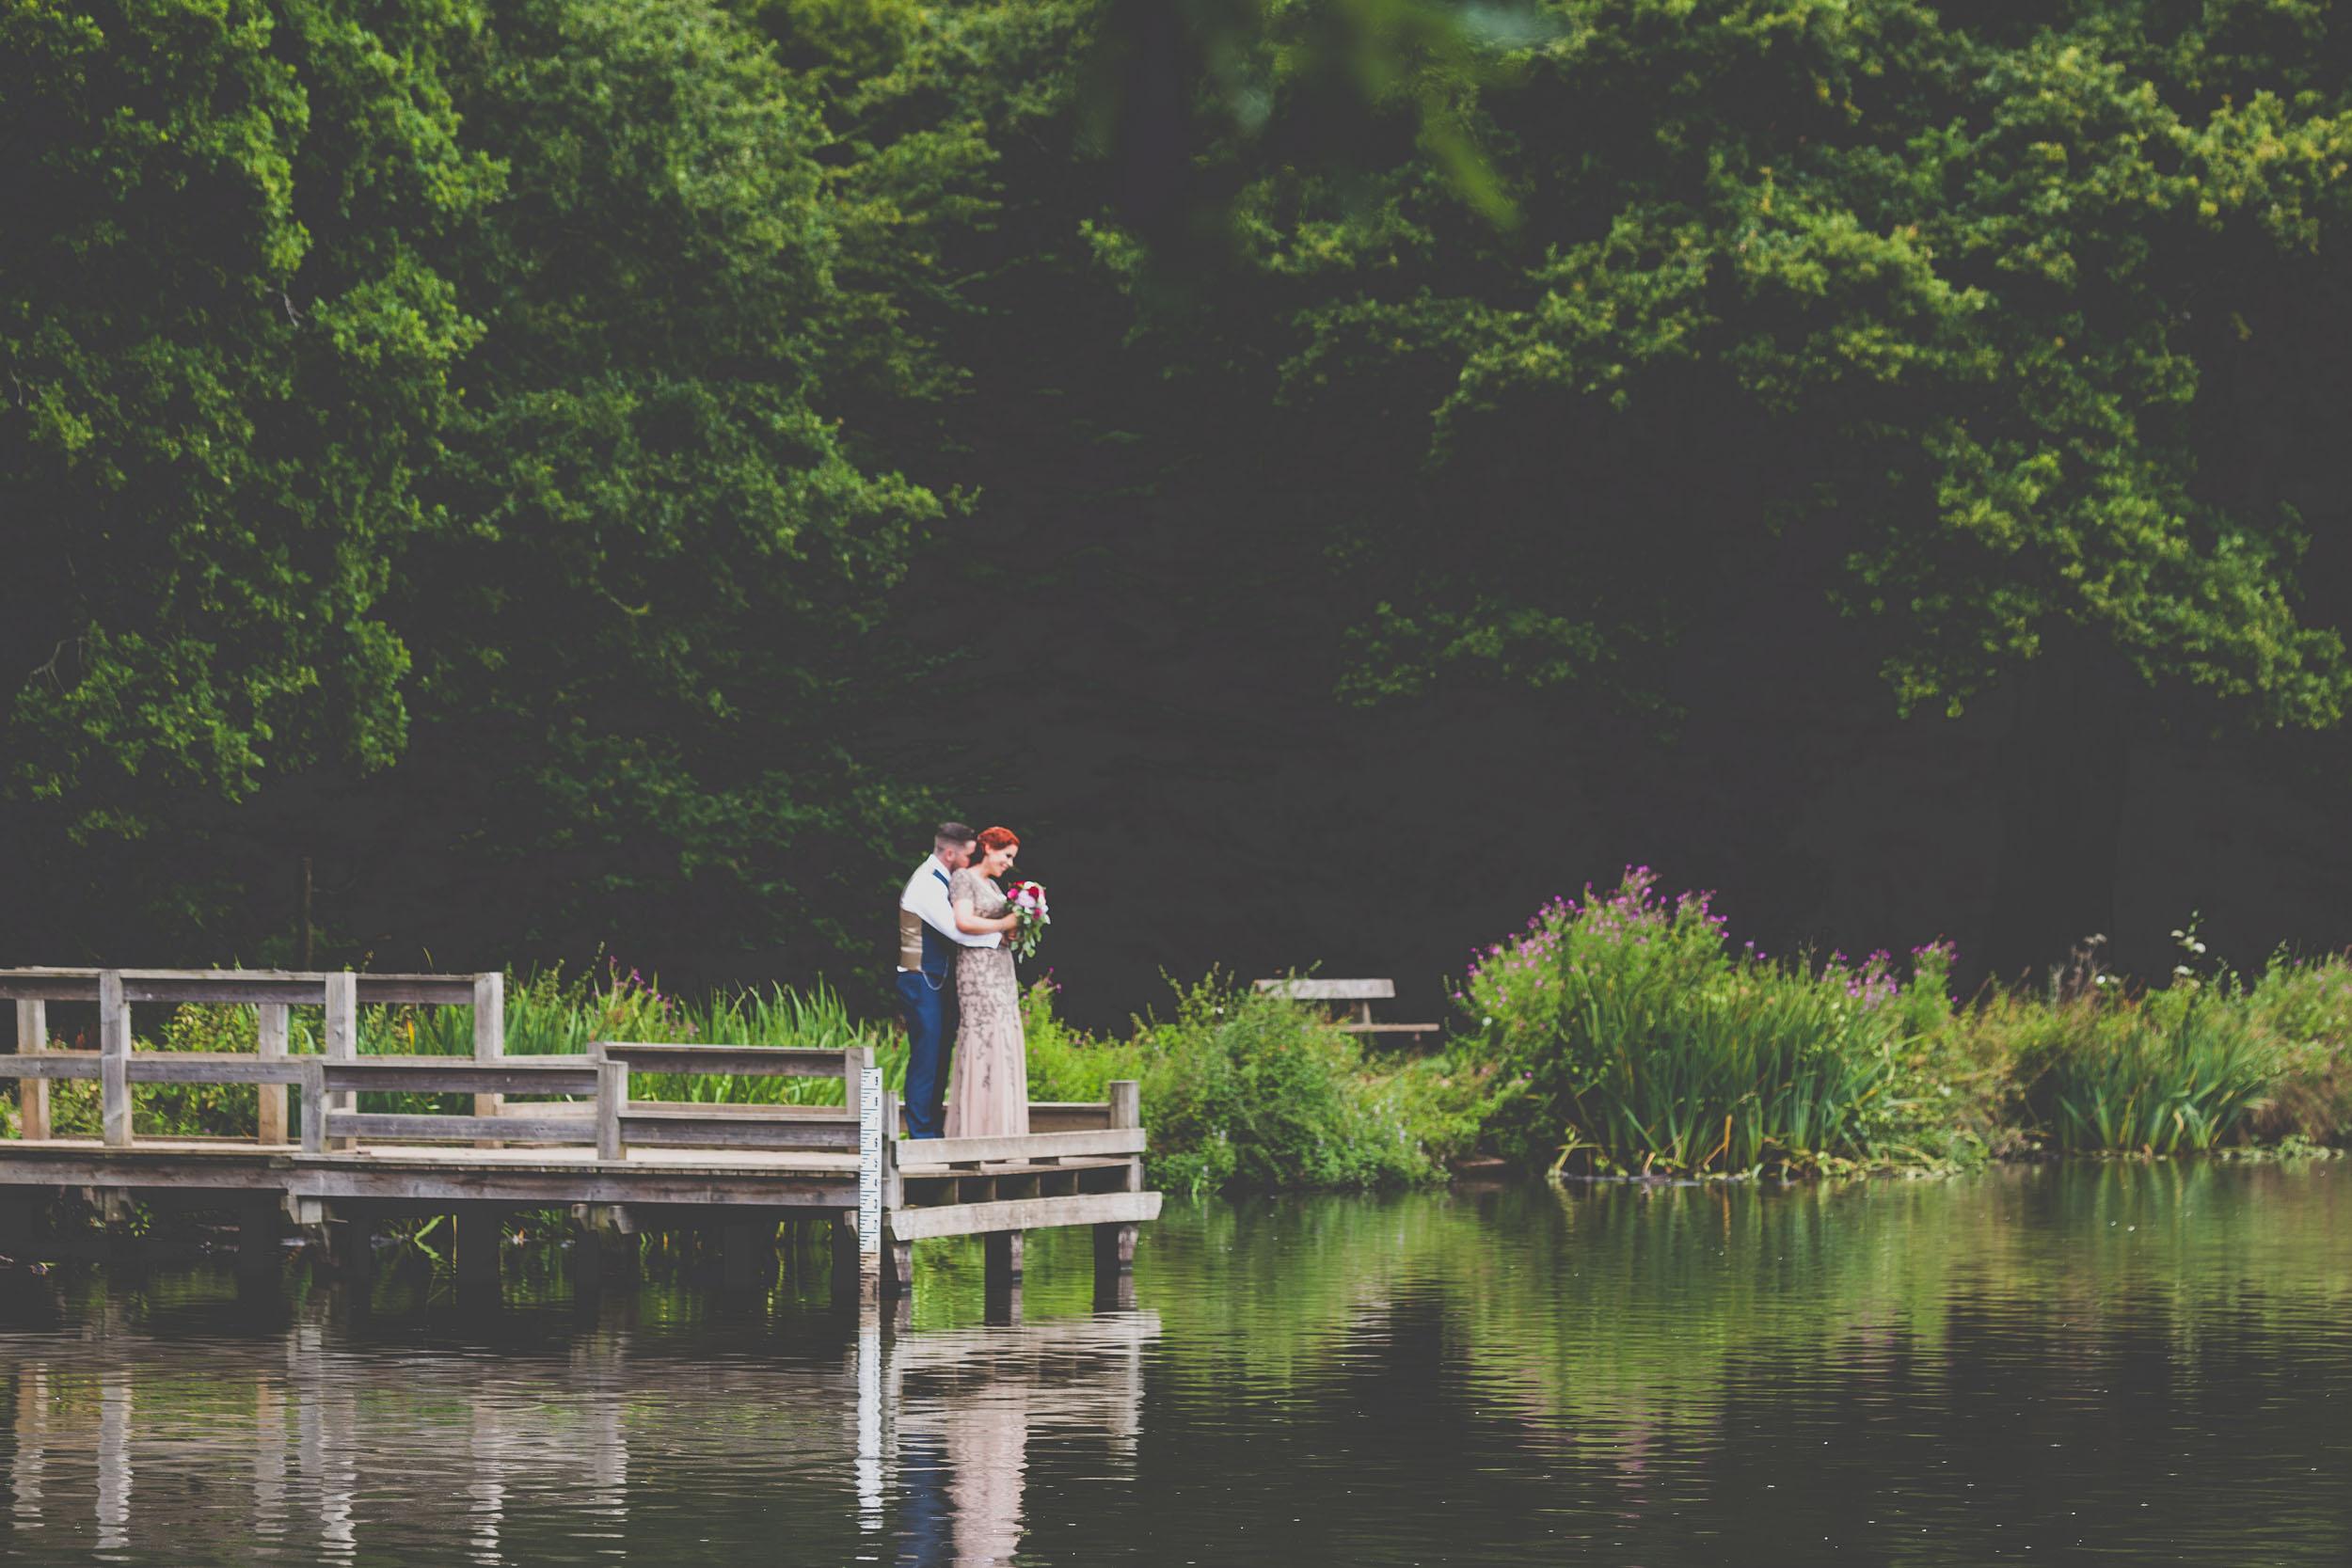 queen-elizabeths-hunting-lodge-epping-forest-wedding268.jpg